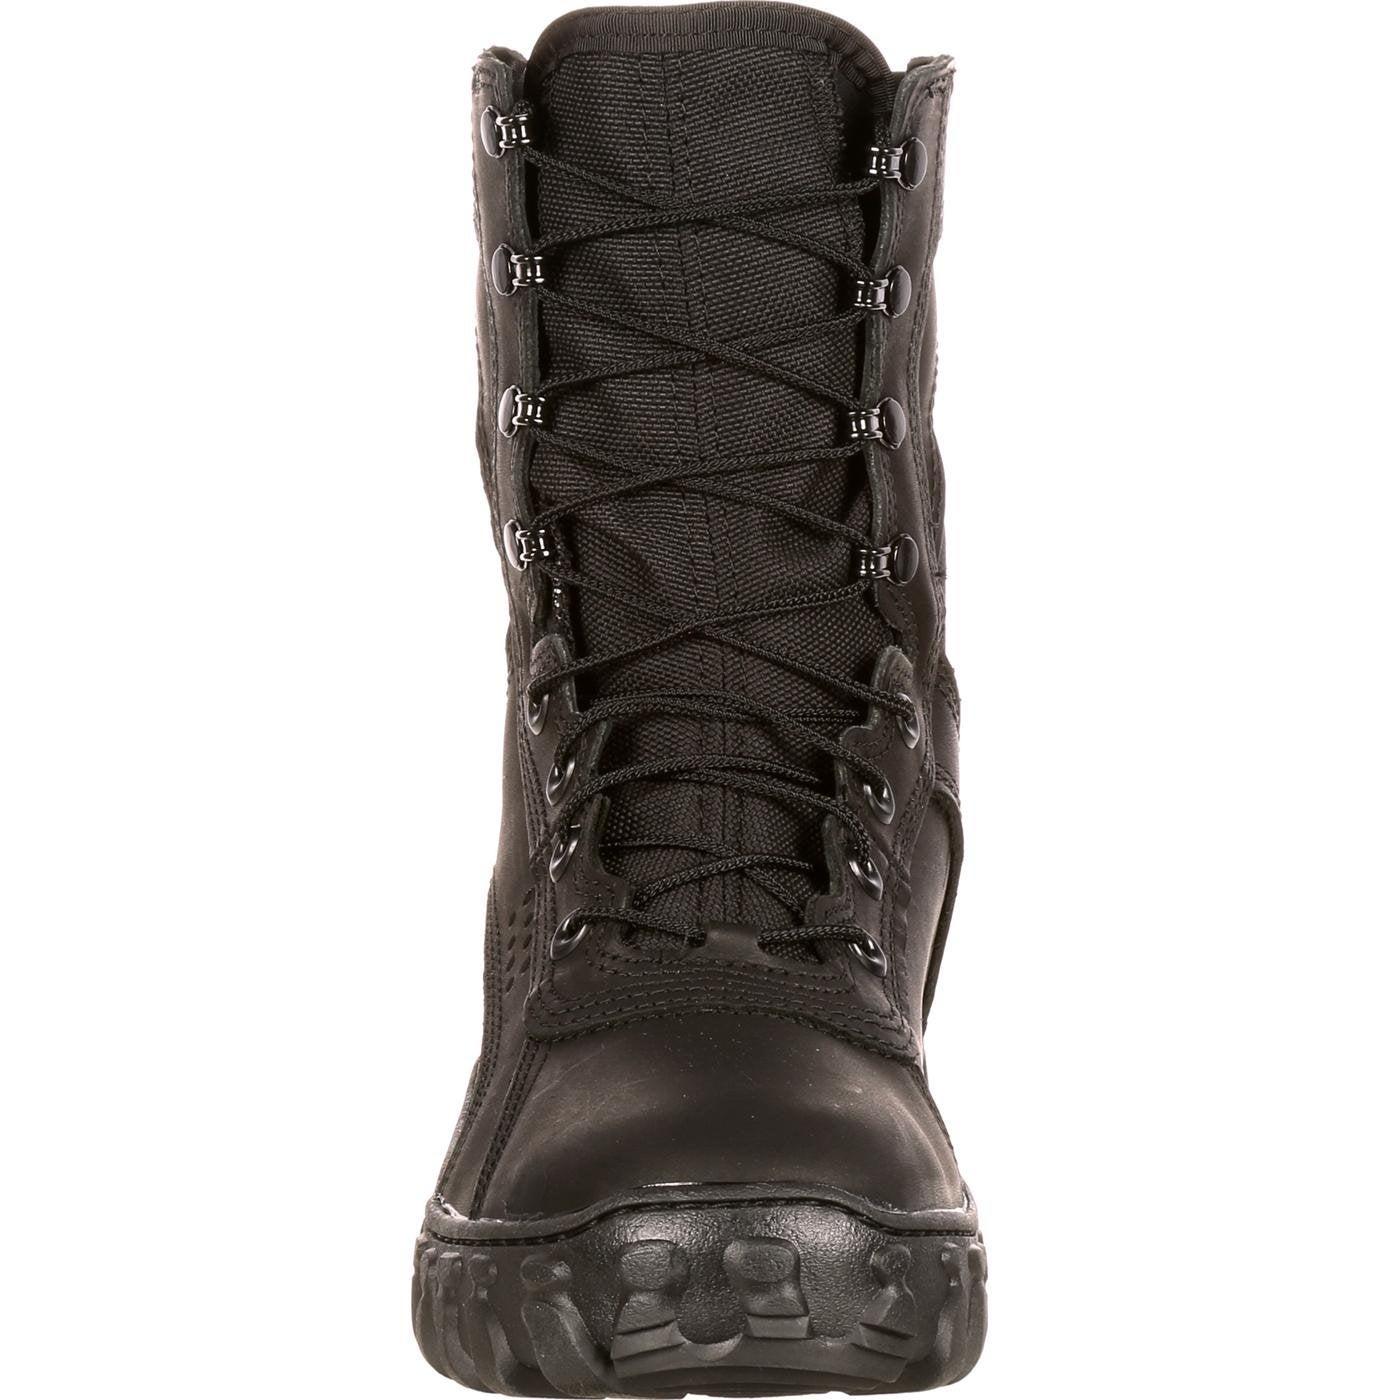 a135e29ac09 Shop Rocky S2V American-Made Black Military Boots